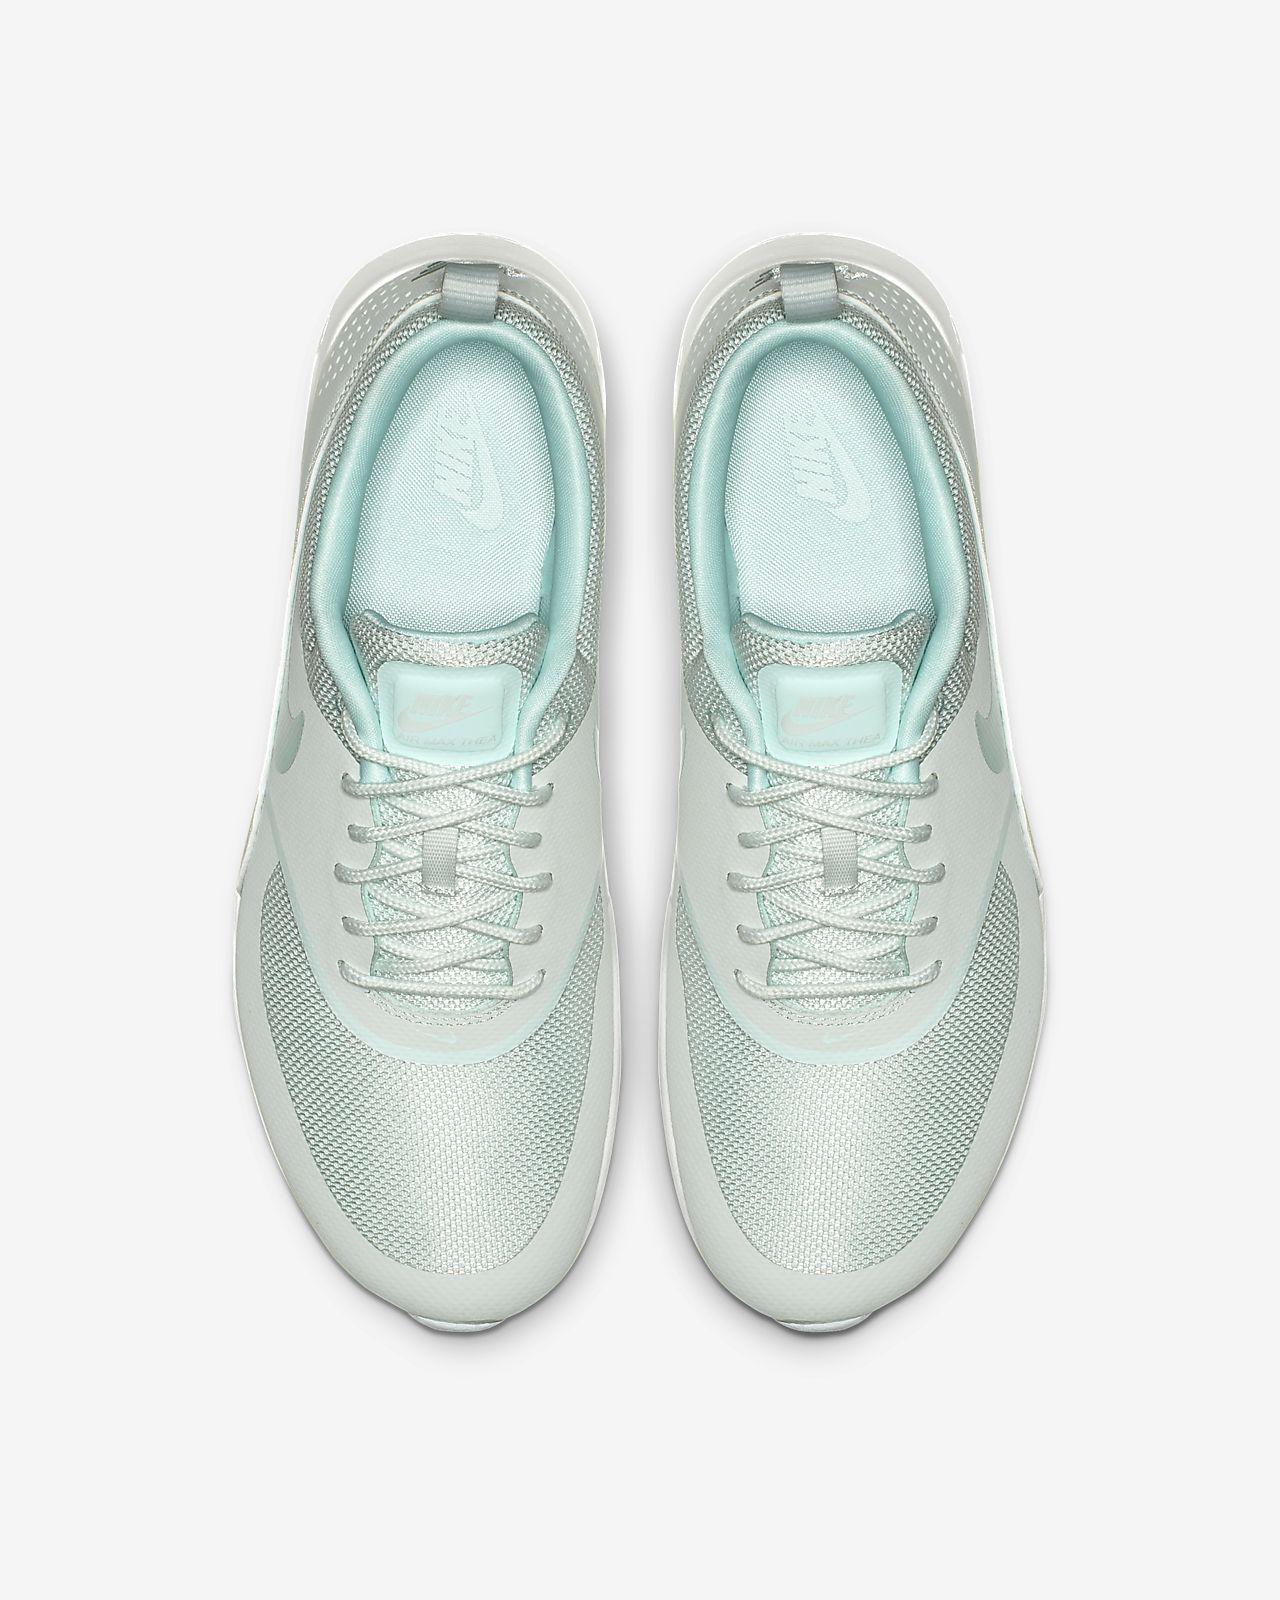 a24e08d25 Nike Air Max Thea Zapatillas - Mujer. Nike.com ES